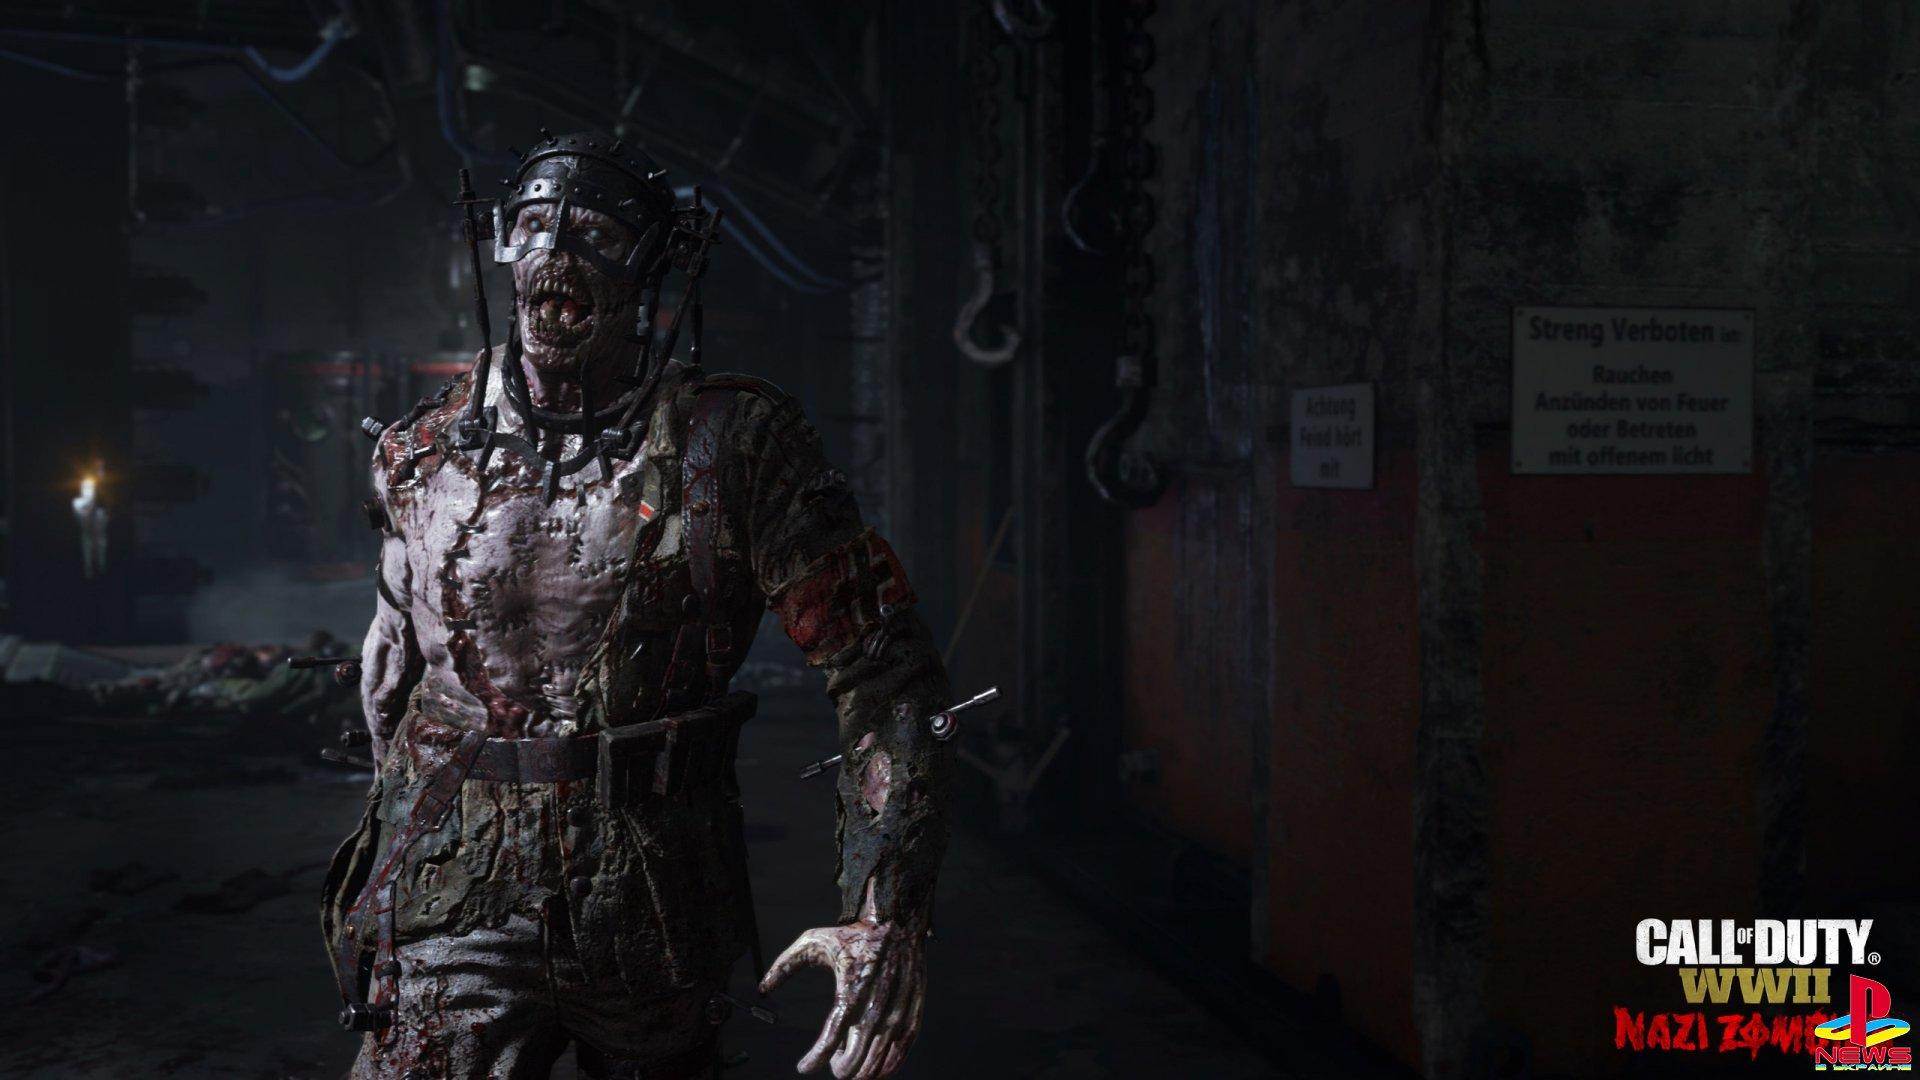 Зомби-режим в Call of Duty: WWII представит самых страш ...